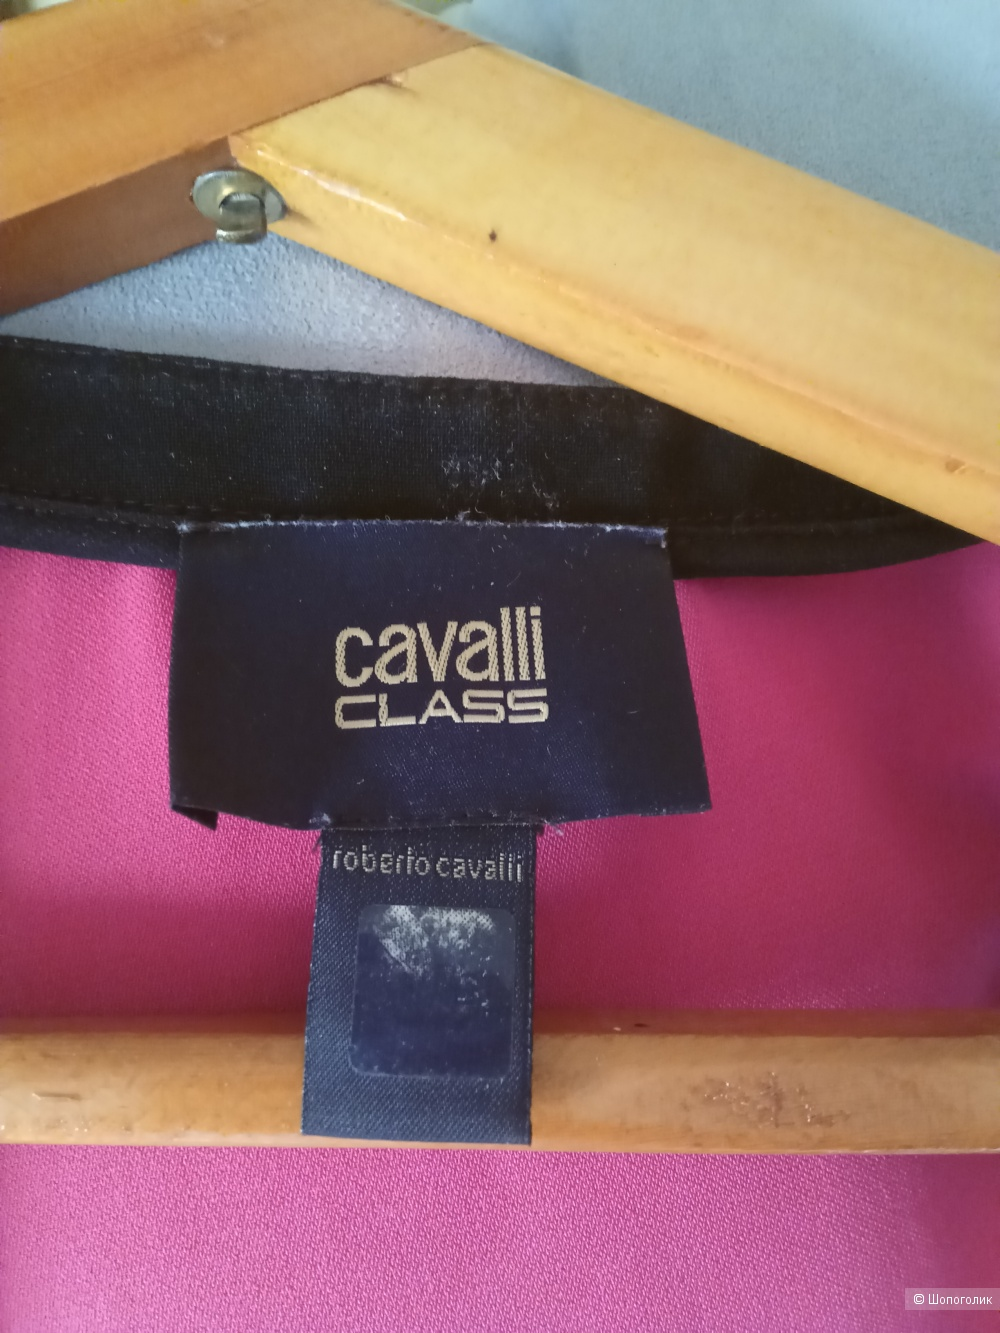 CAVALLI CLASS топ размер 46 русский